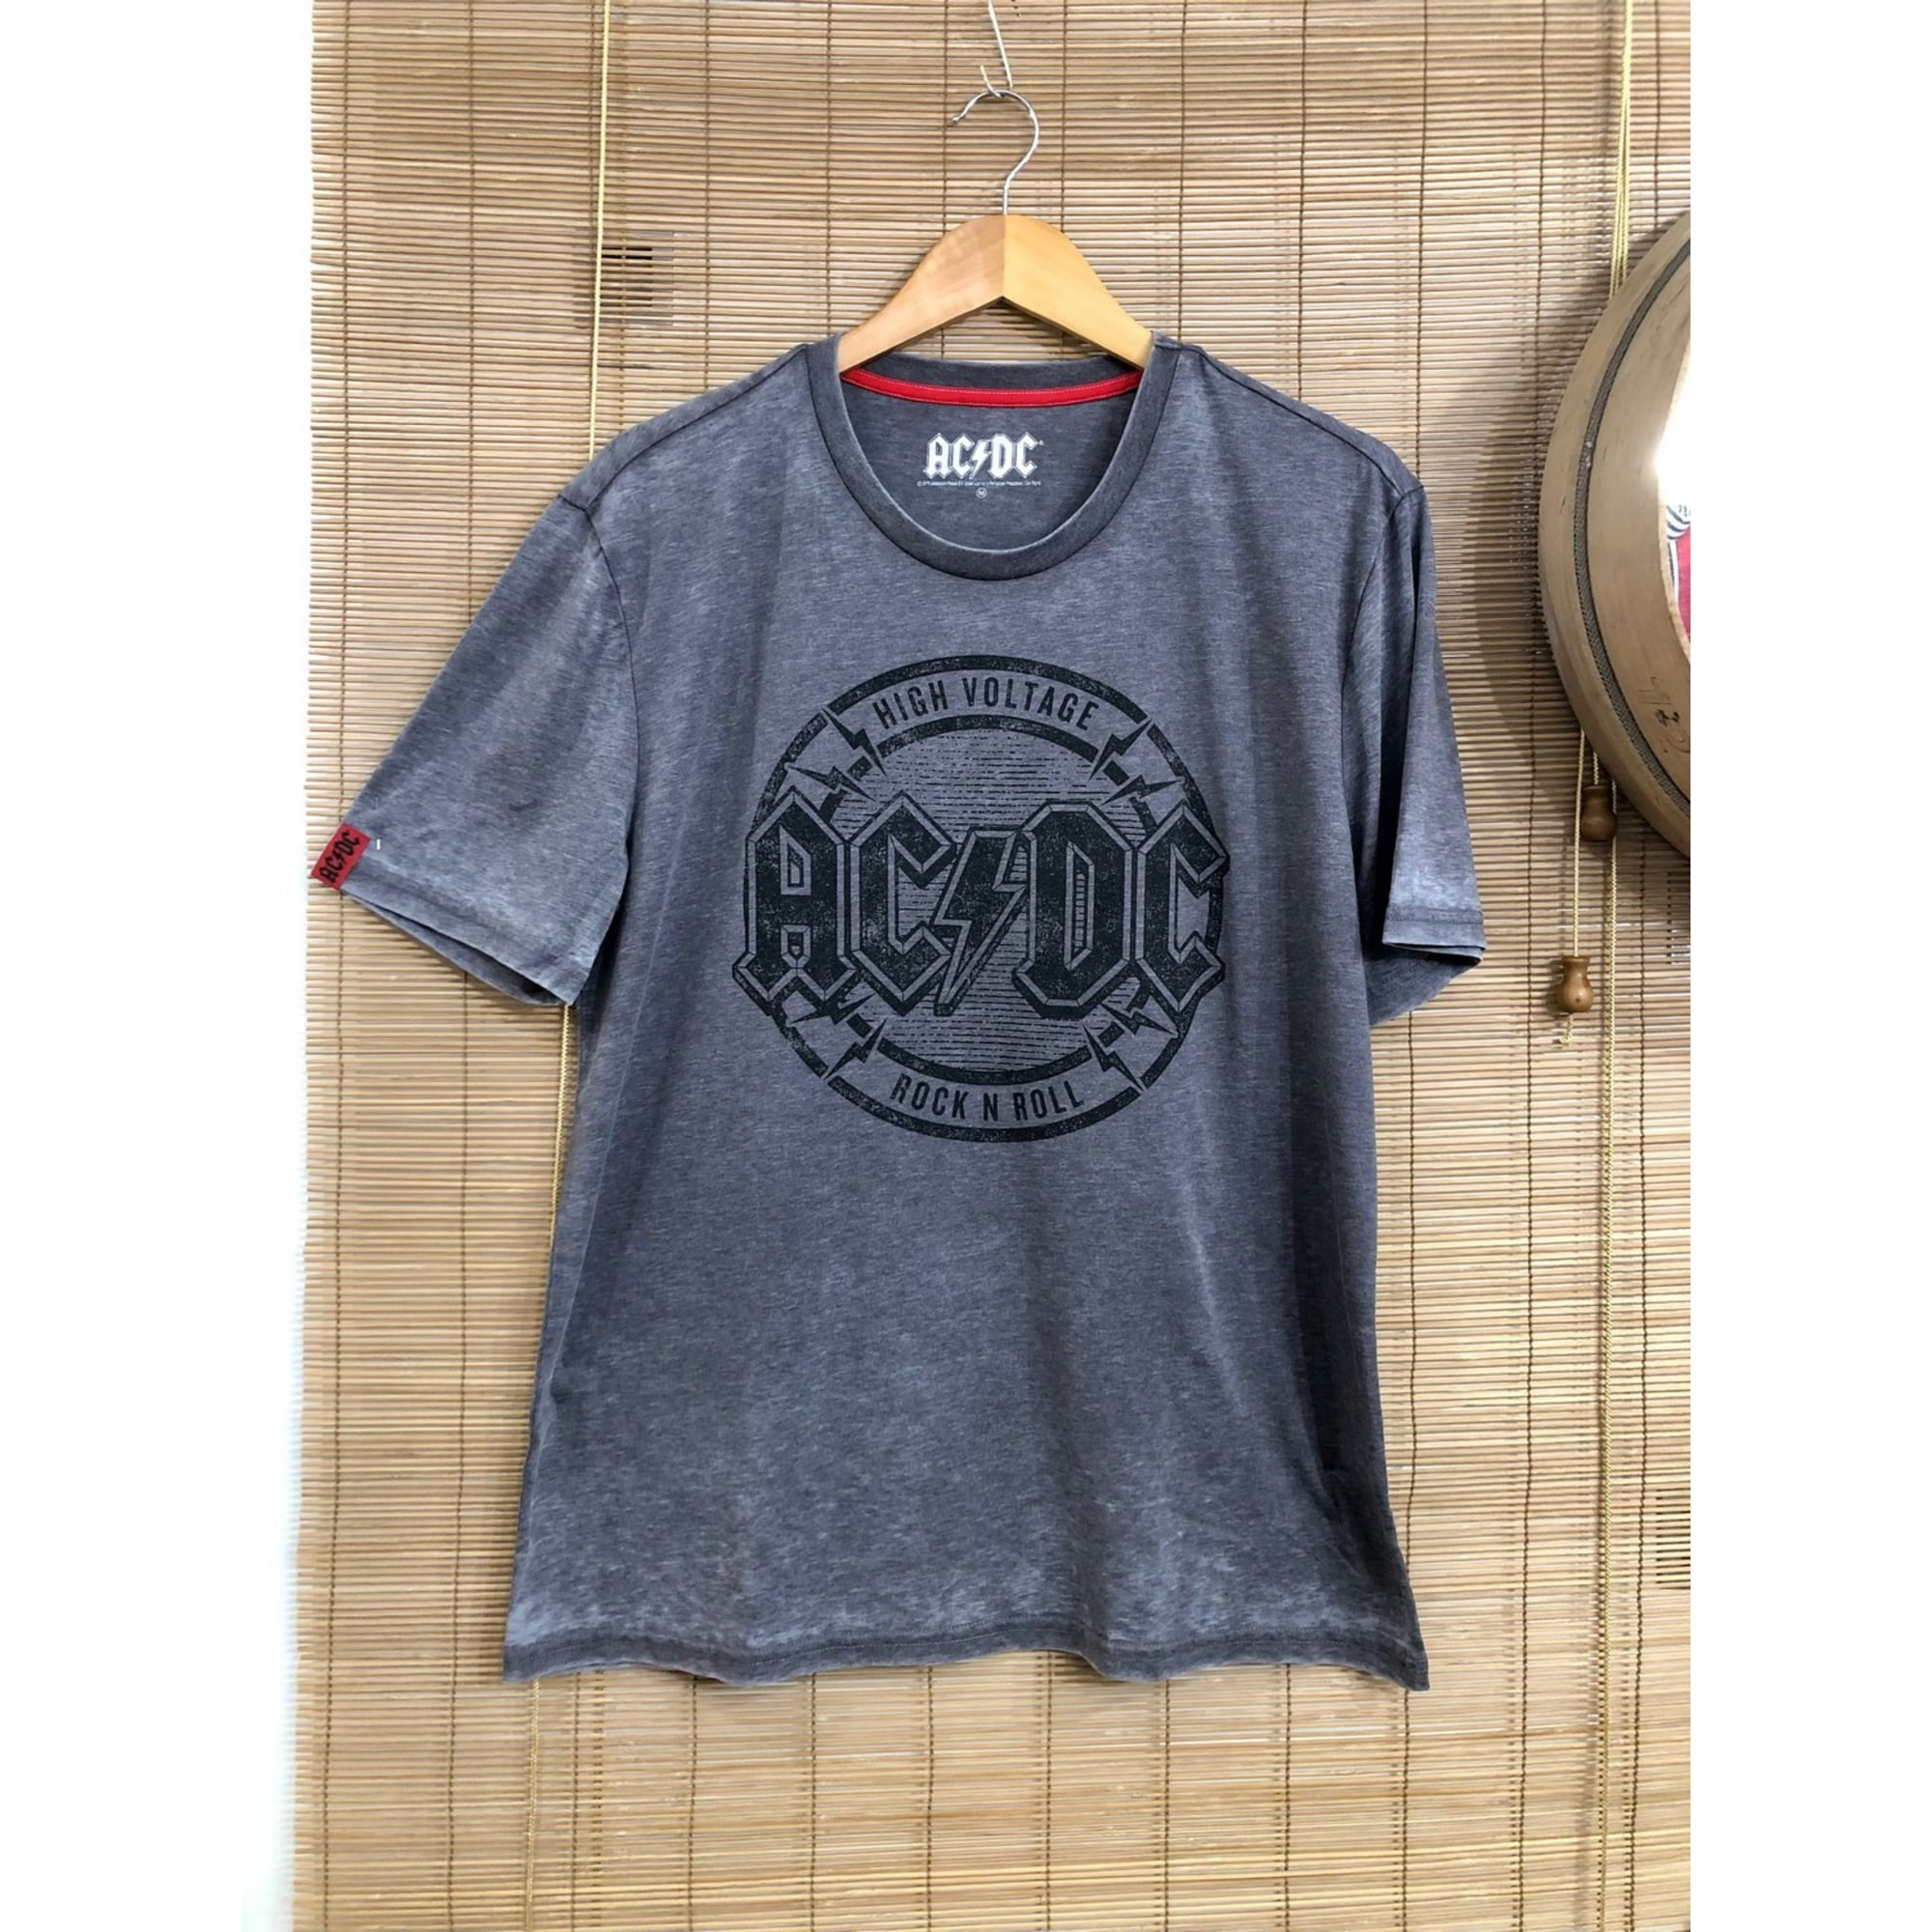 Tee-shirt AC/DC Gris, anthracite